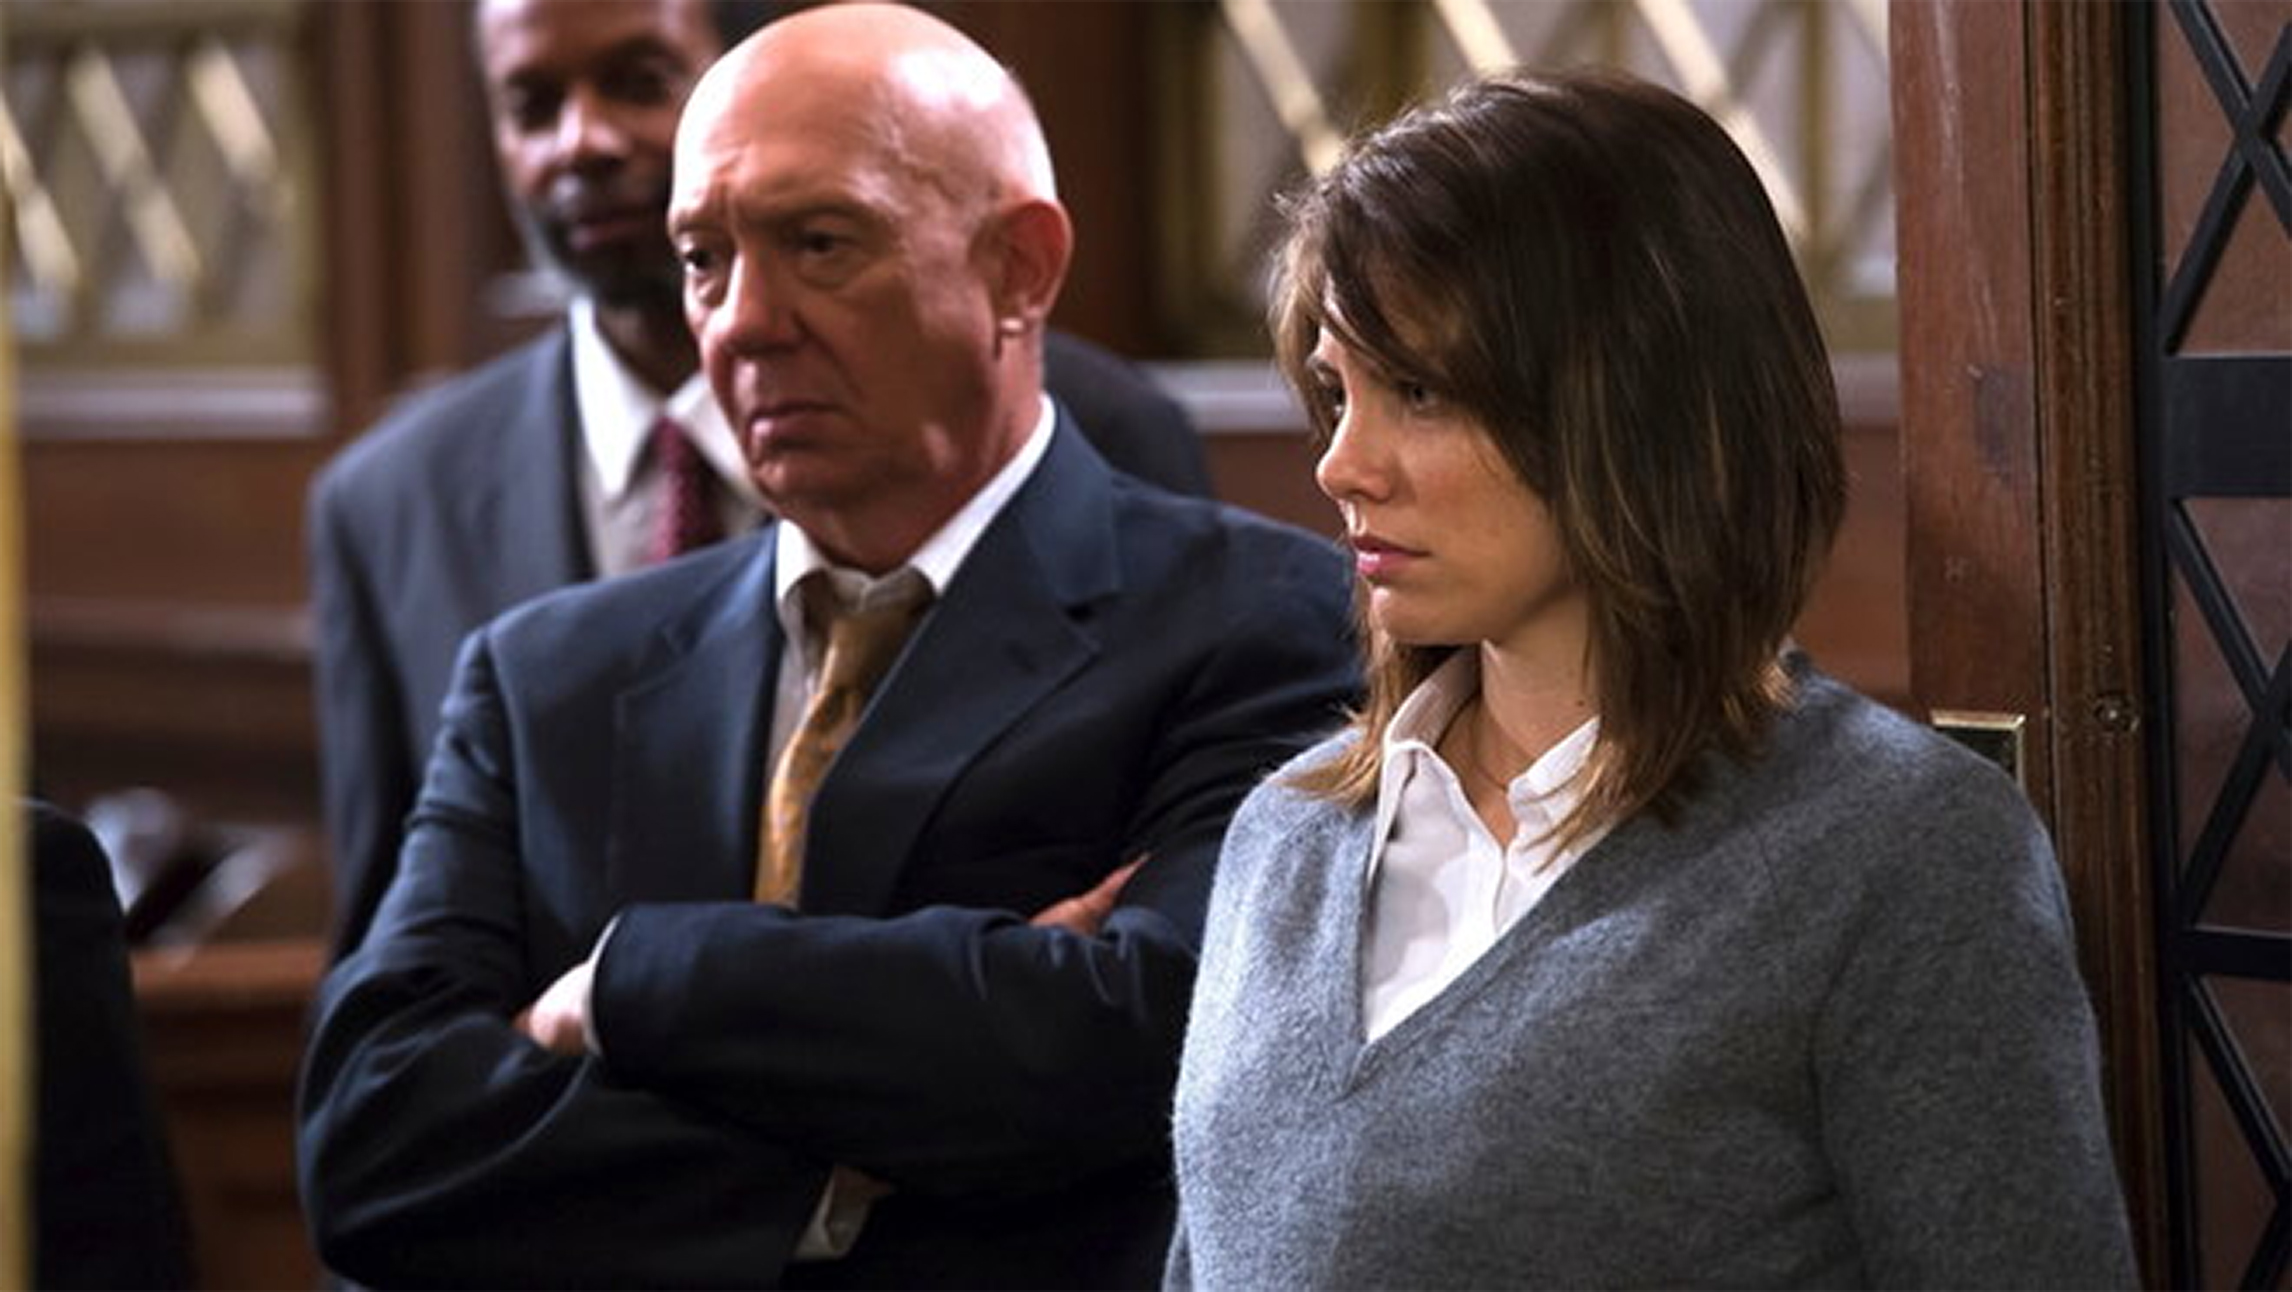 Law & Order: Special Victims Unit: Legitimate Rape